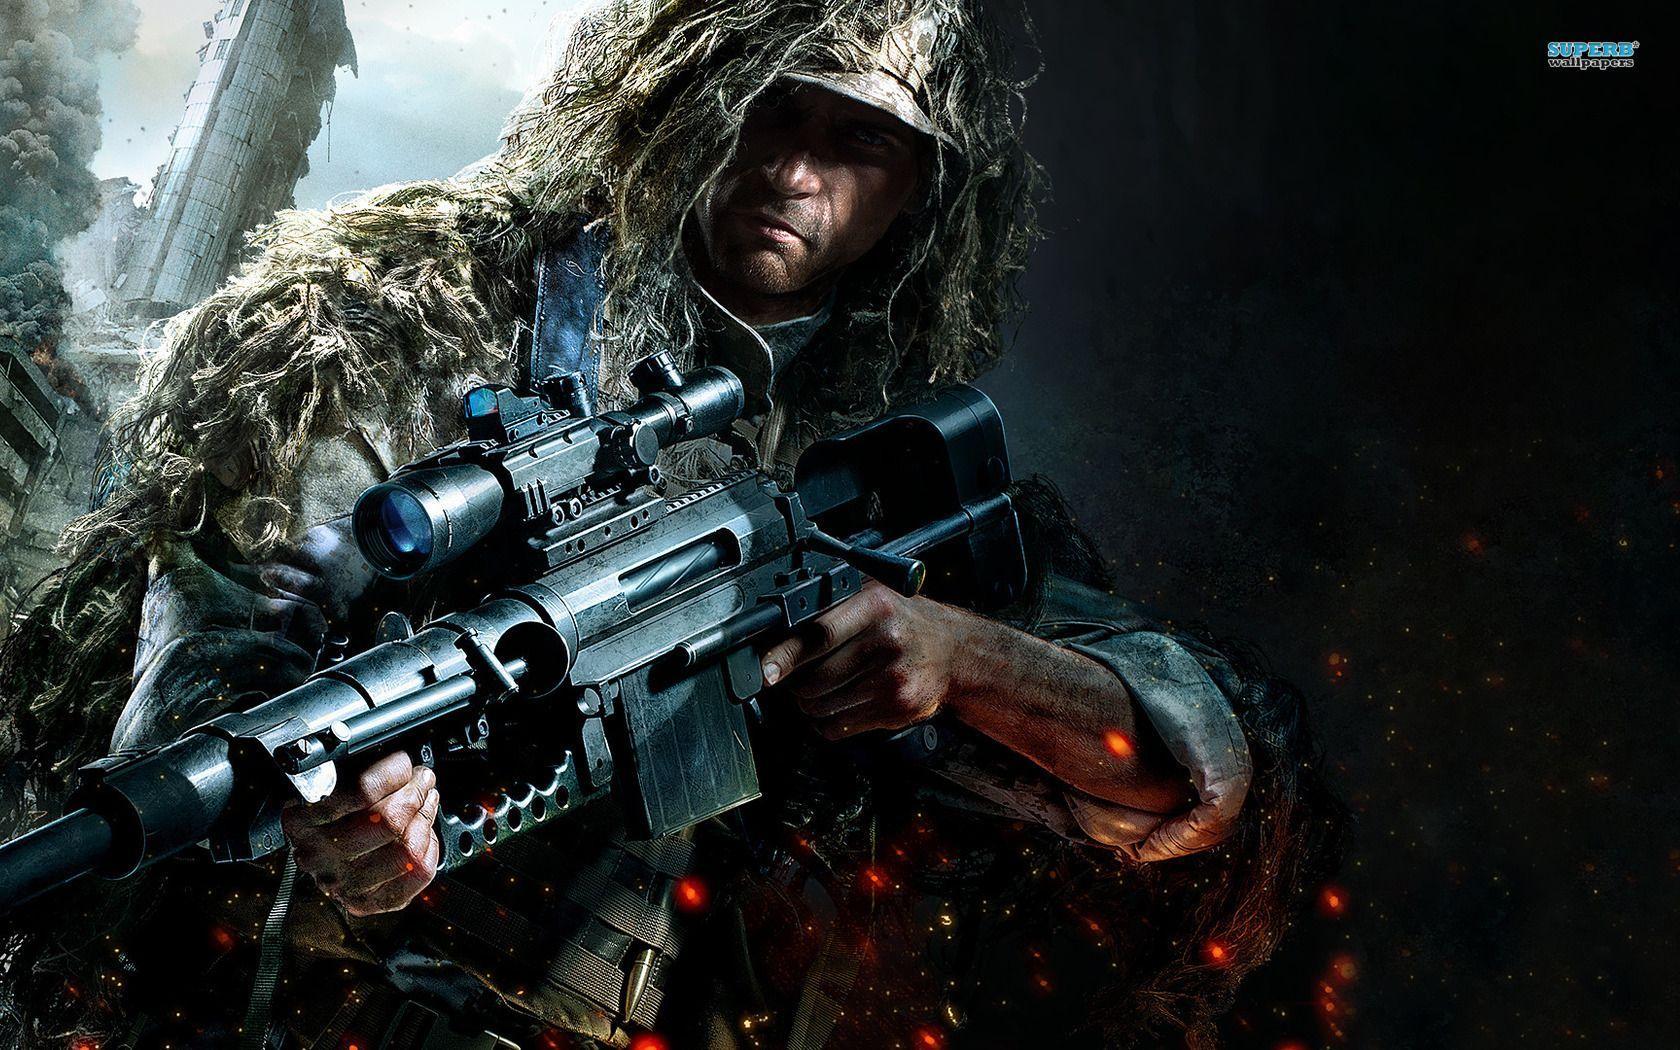 Sniper: Ghost Warrior Wallpapers